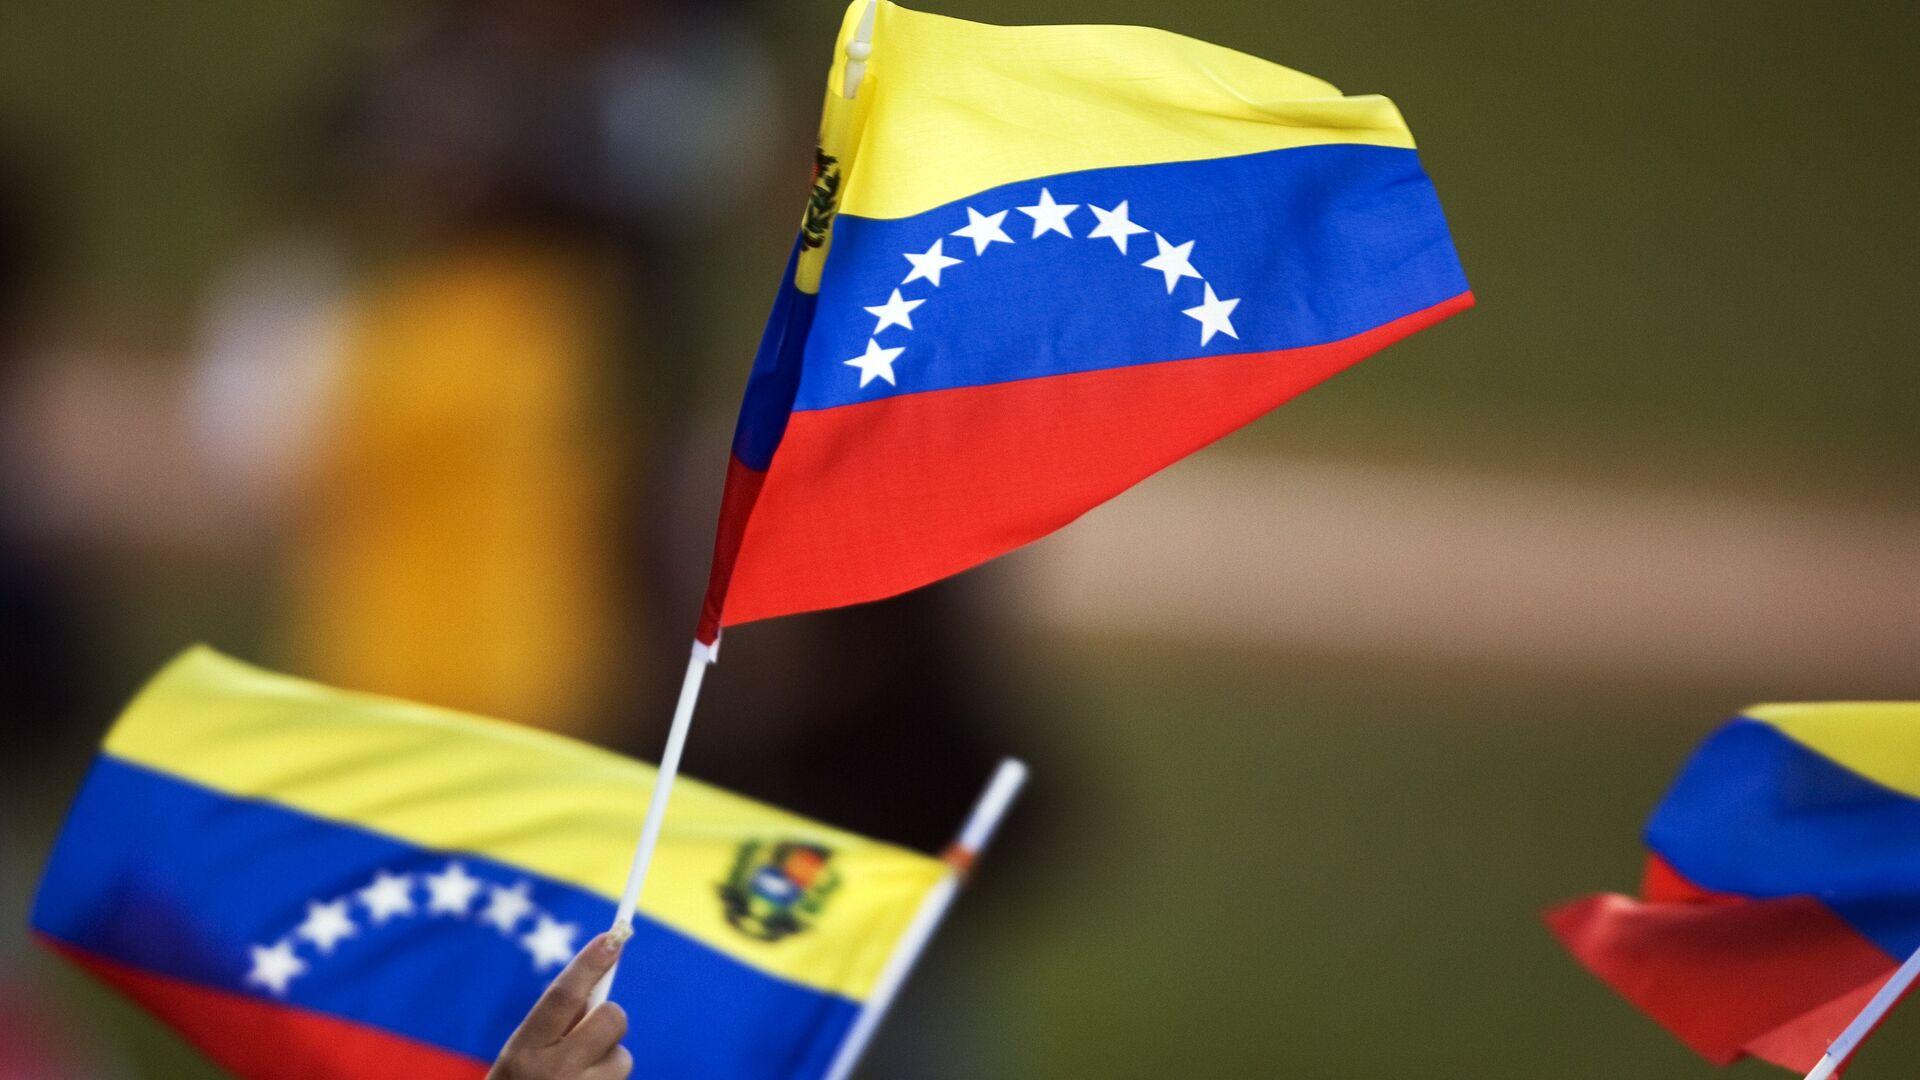 Banderas de Venezuela - Sputnik Mundo, 1920, 26.03.2021